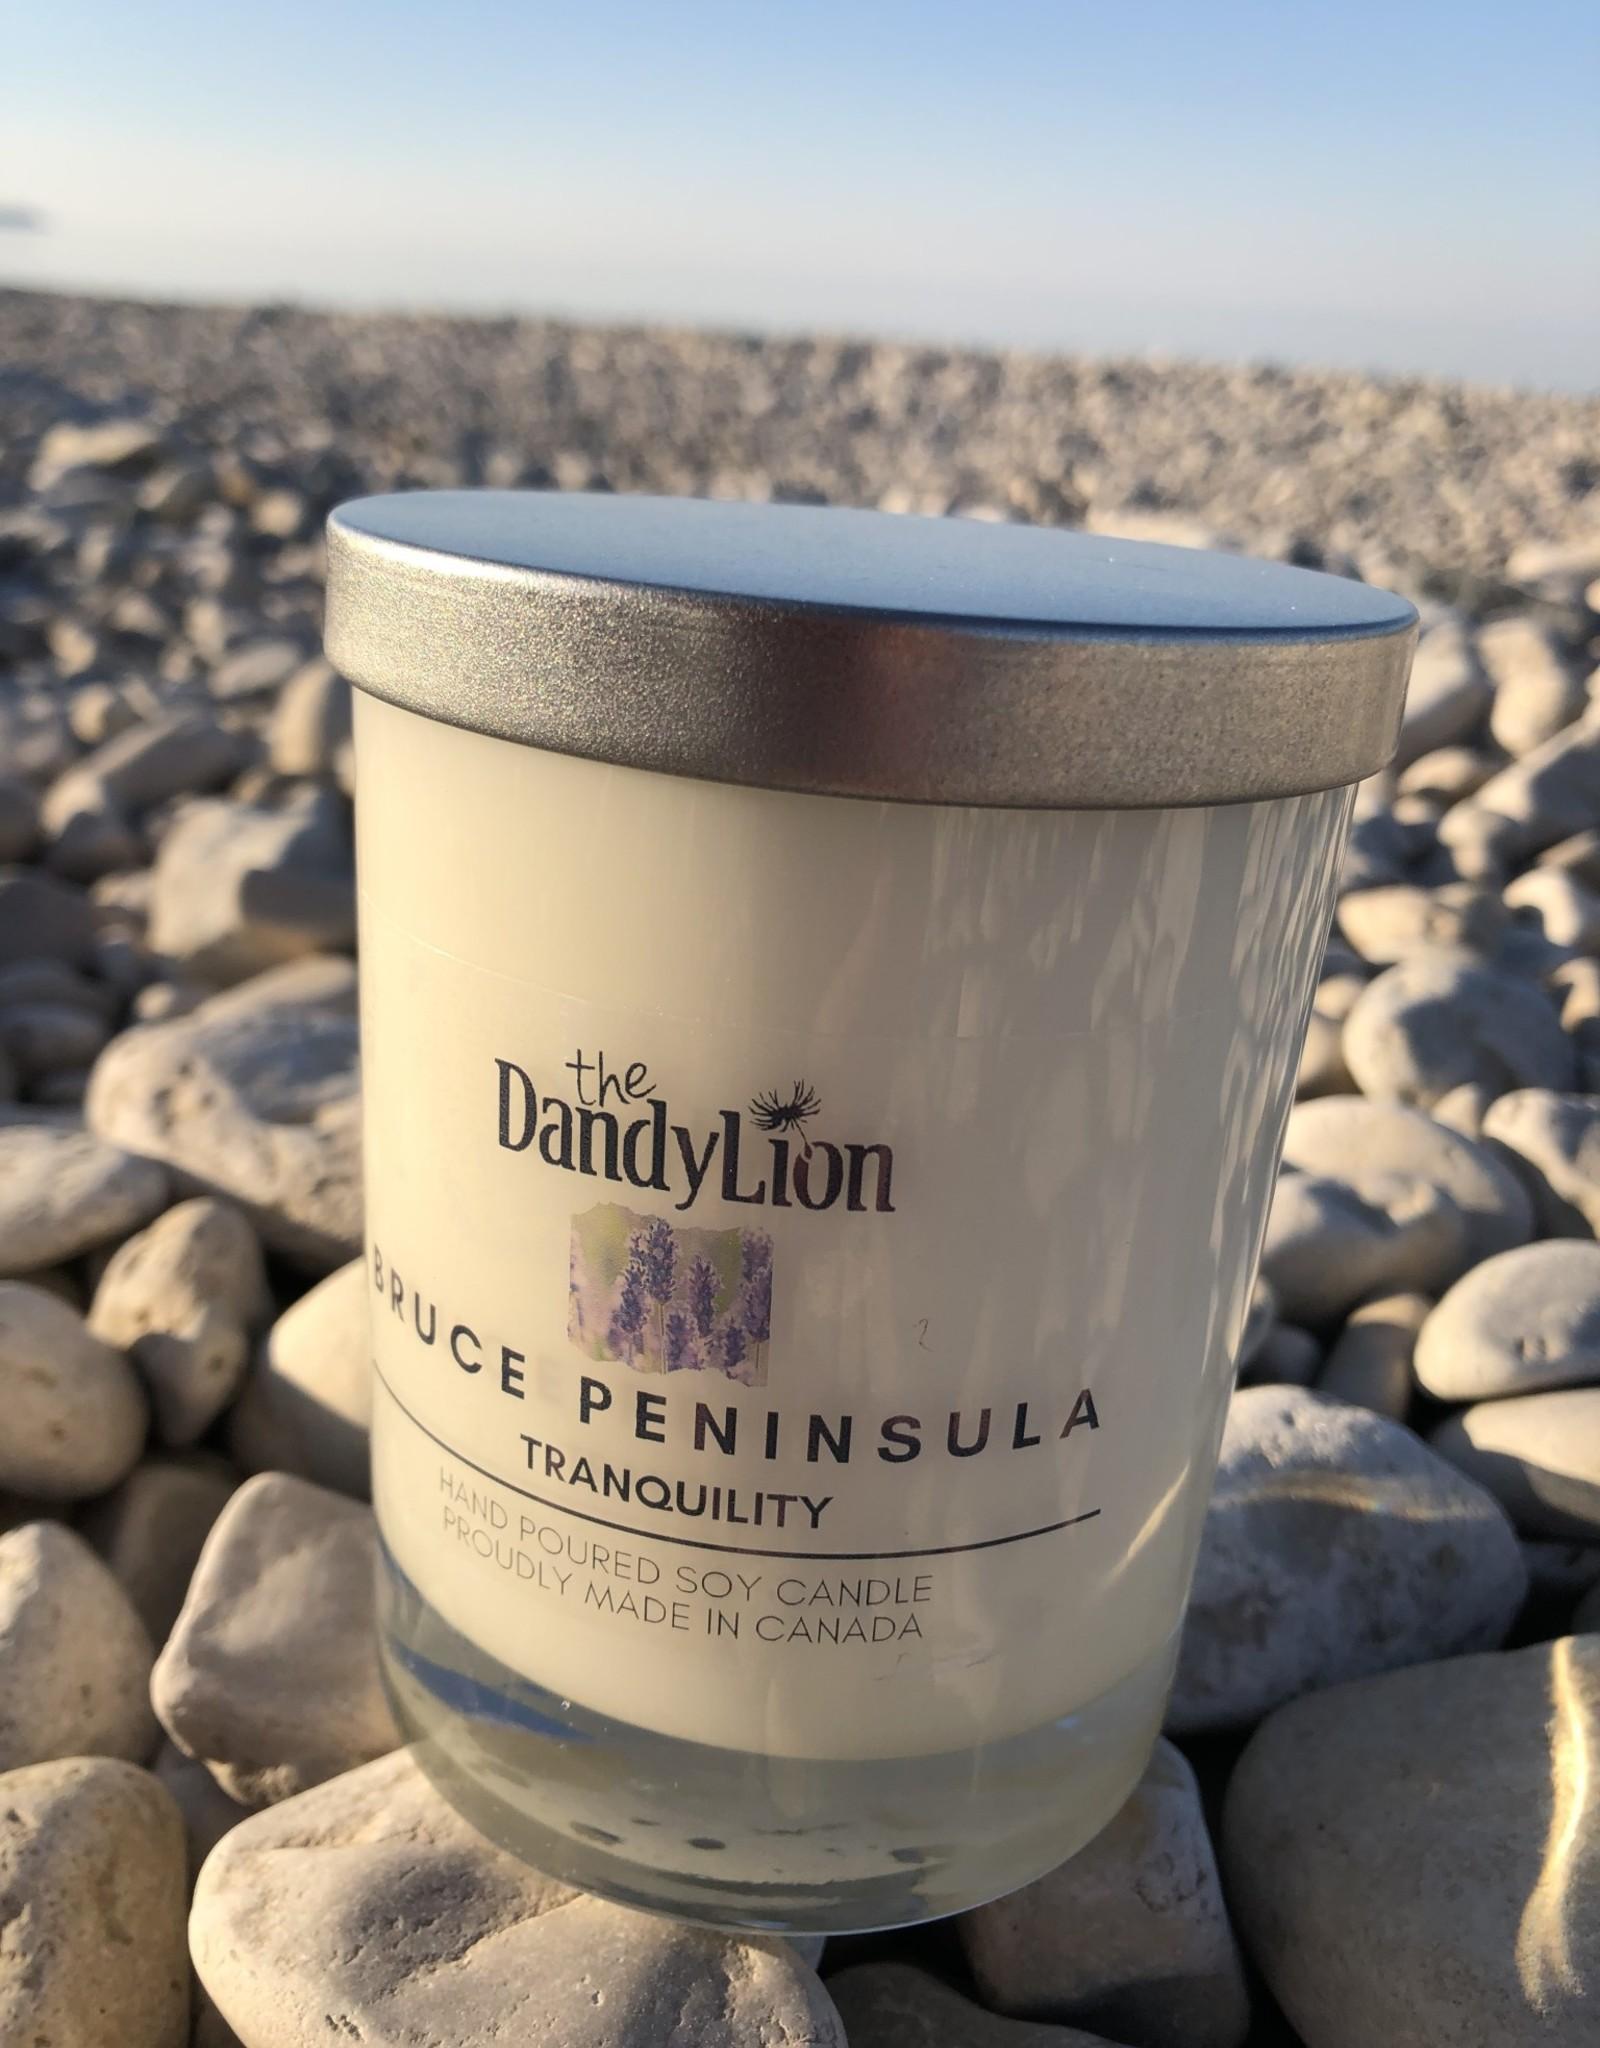 serendipity Bruce Peninsula 12 oz candle Tranquility